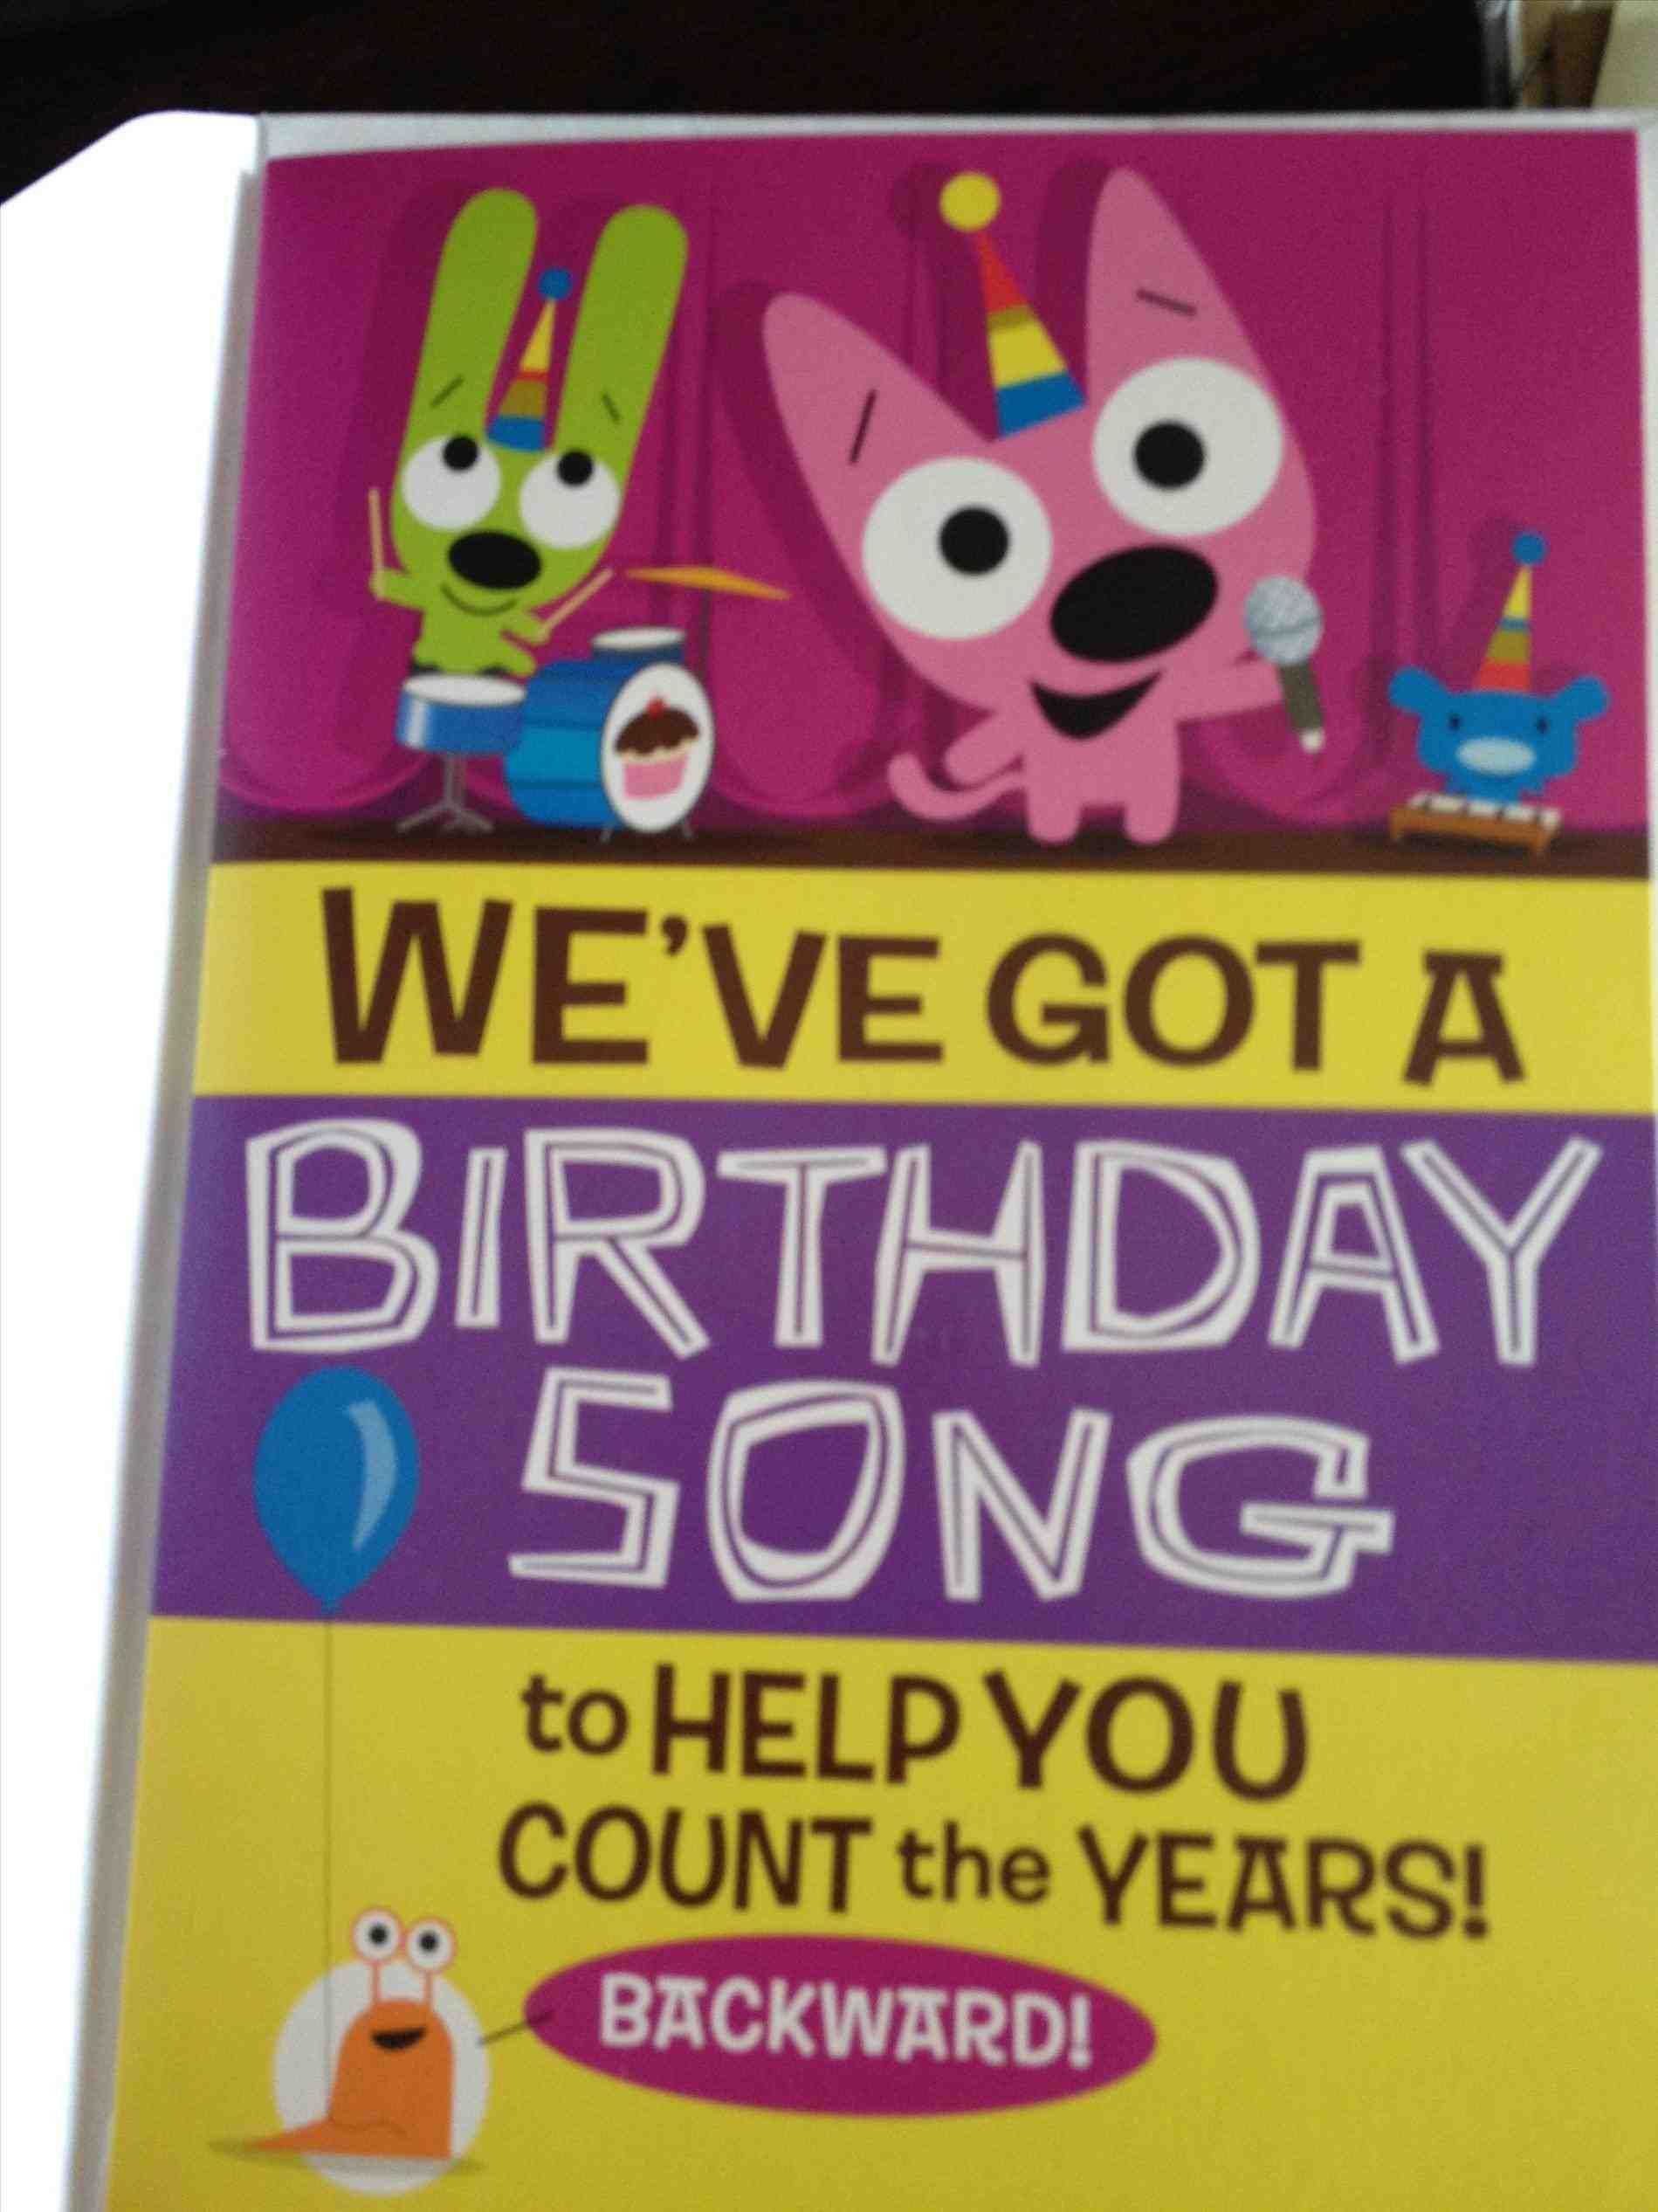 Birthday ideas for winning online birthday cards funny and online birthday ideas for winning online birthday cards funny and online birthday cards brother show some m4hsunfo